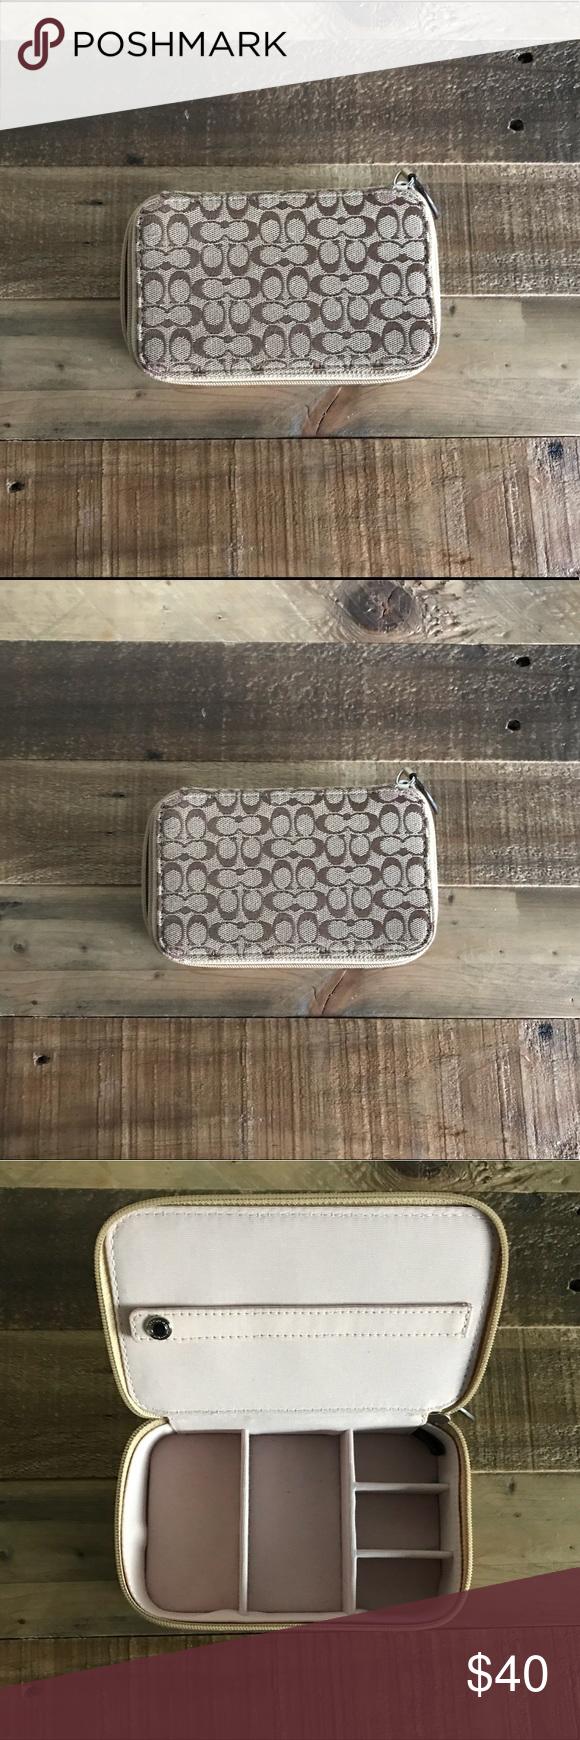 Coach Jewelry Box coach pattern travel jewelry box with zipper and